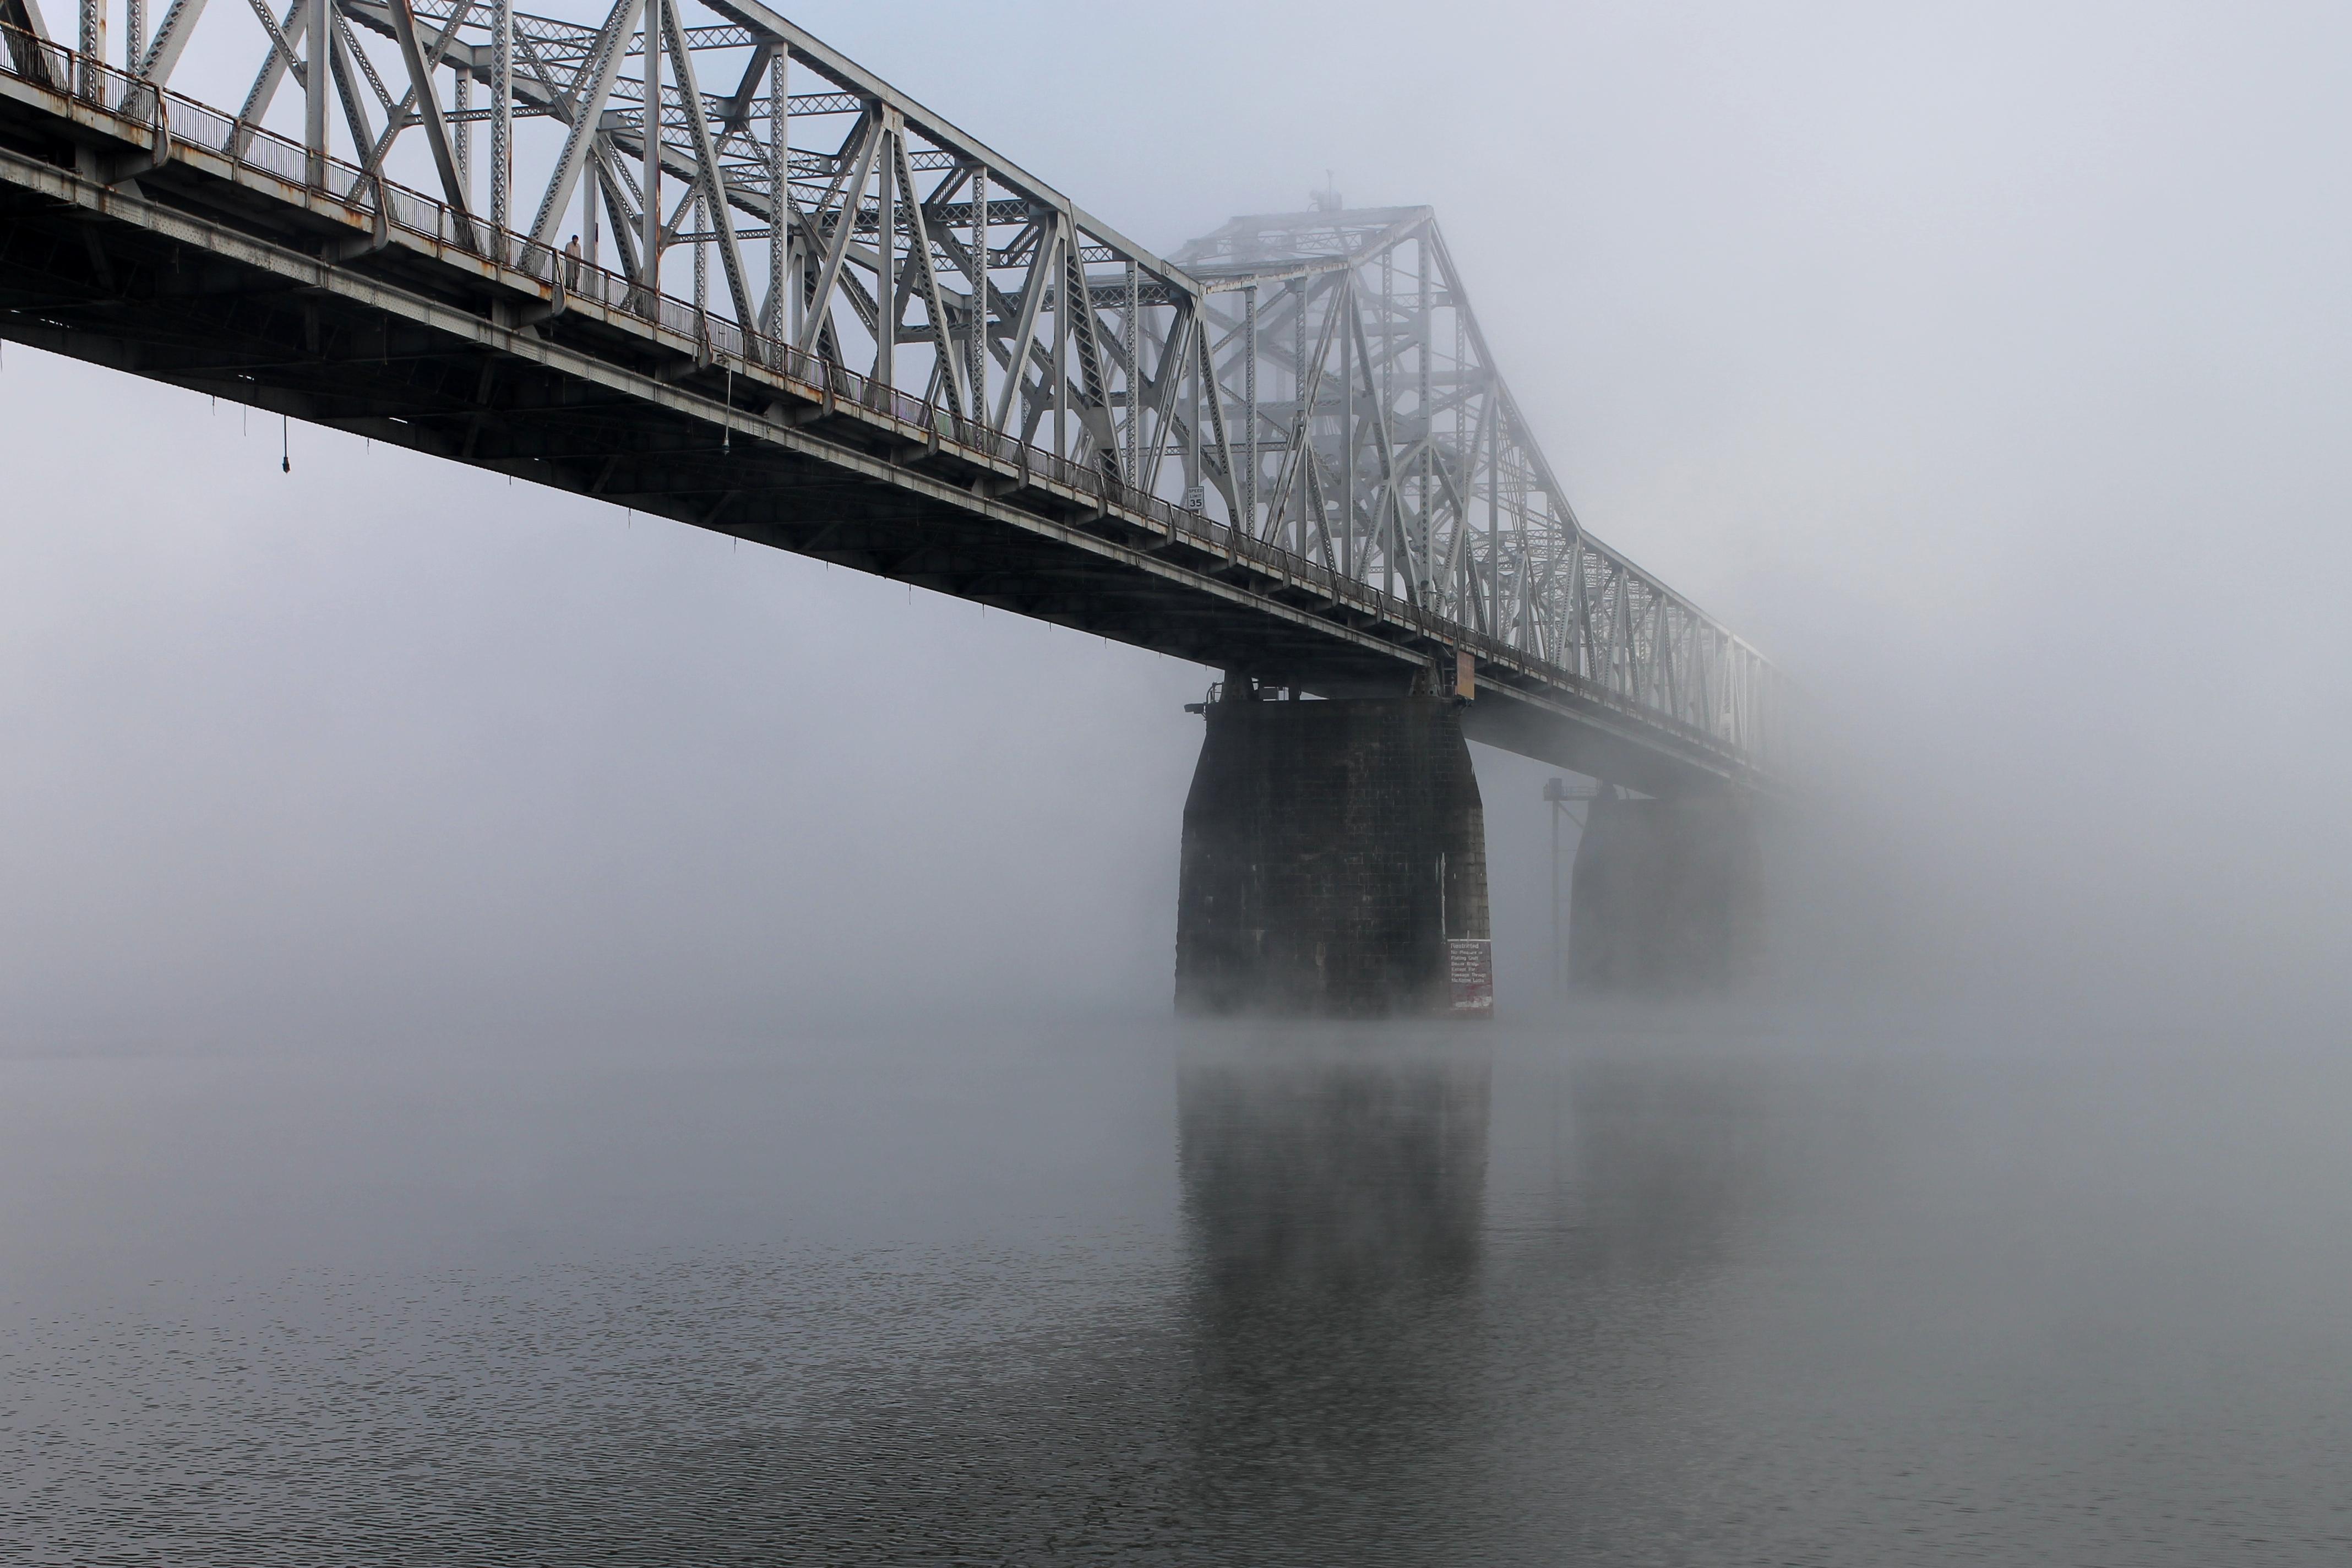 18 2013 10 27 55 Louisville.JPG